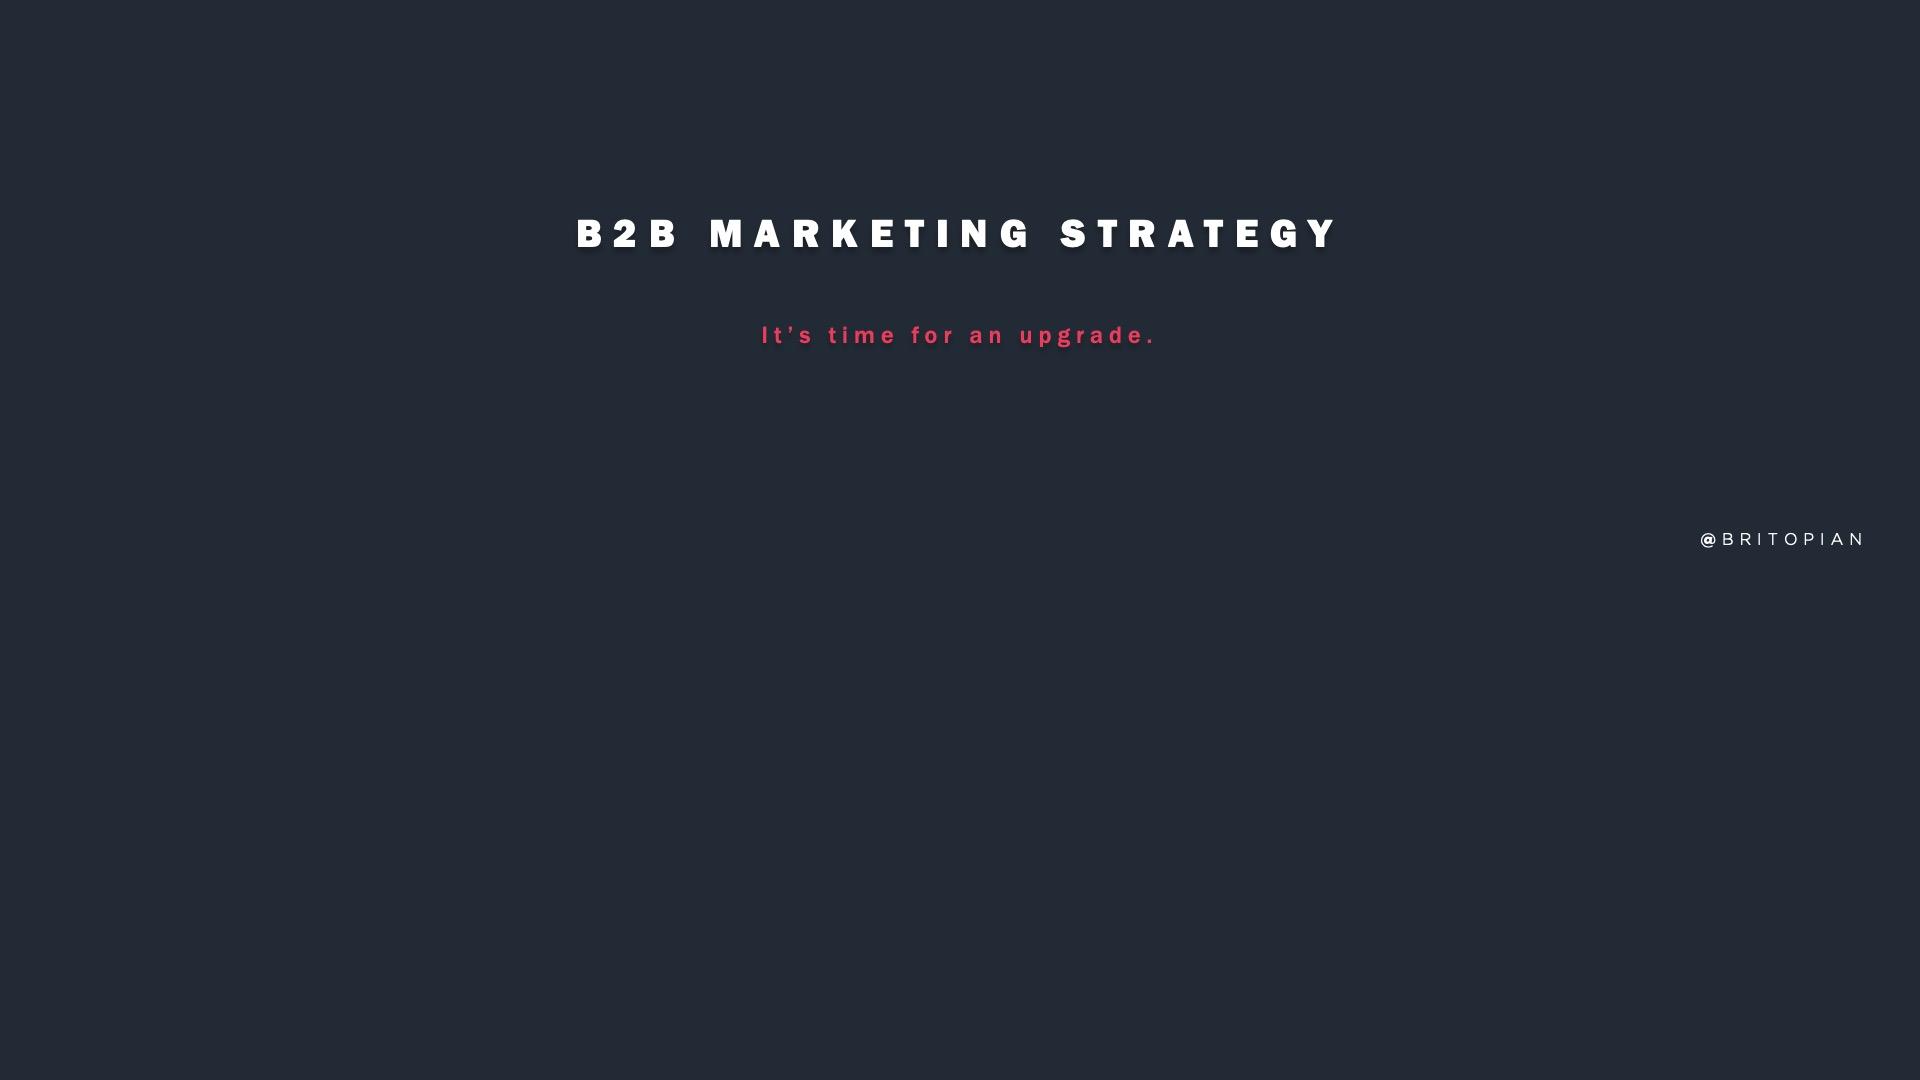 B2B Marketing Strategy: It's Time to Start Thinking About Data Analytics